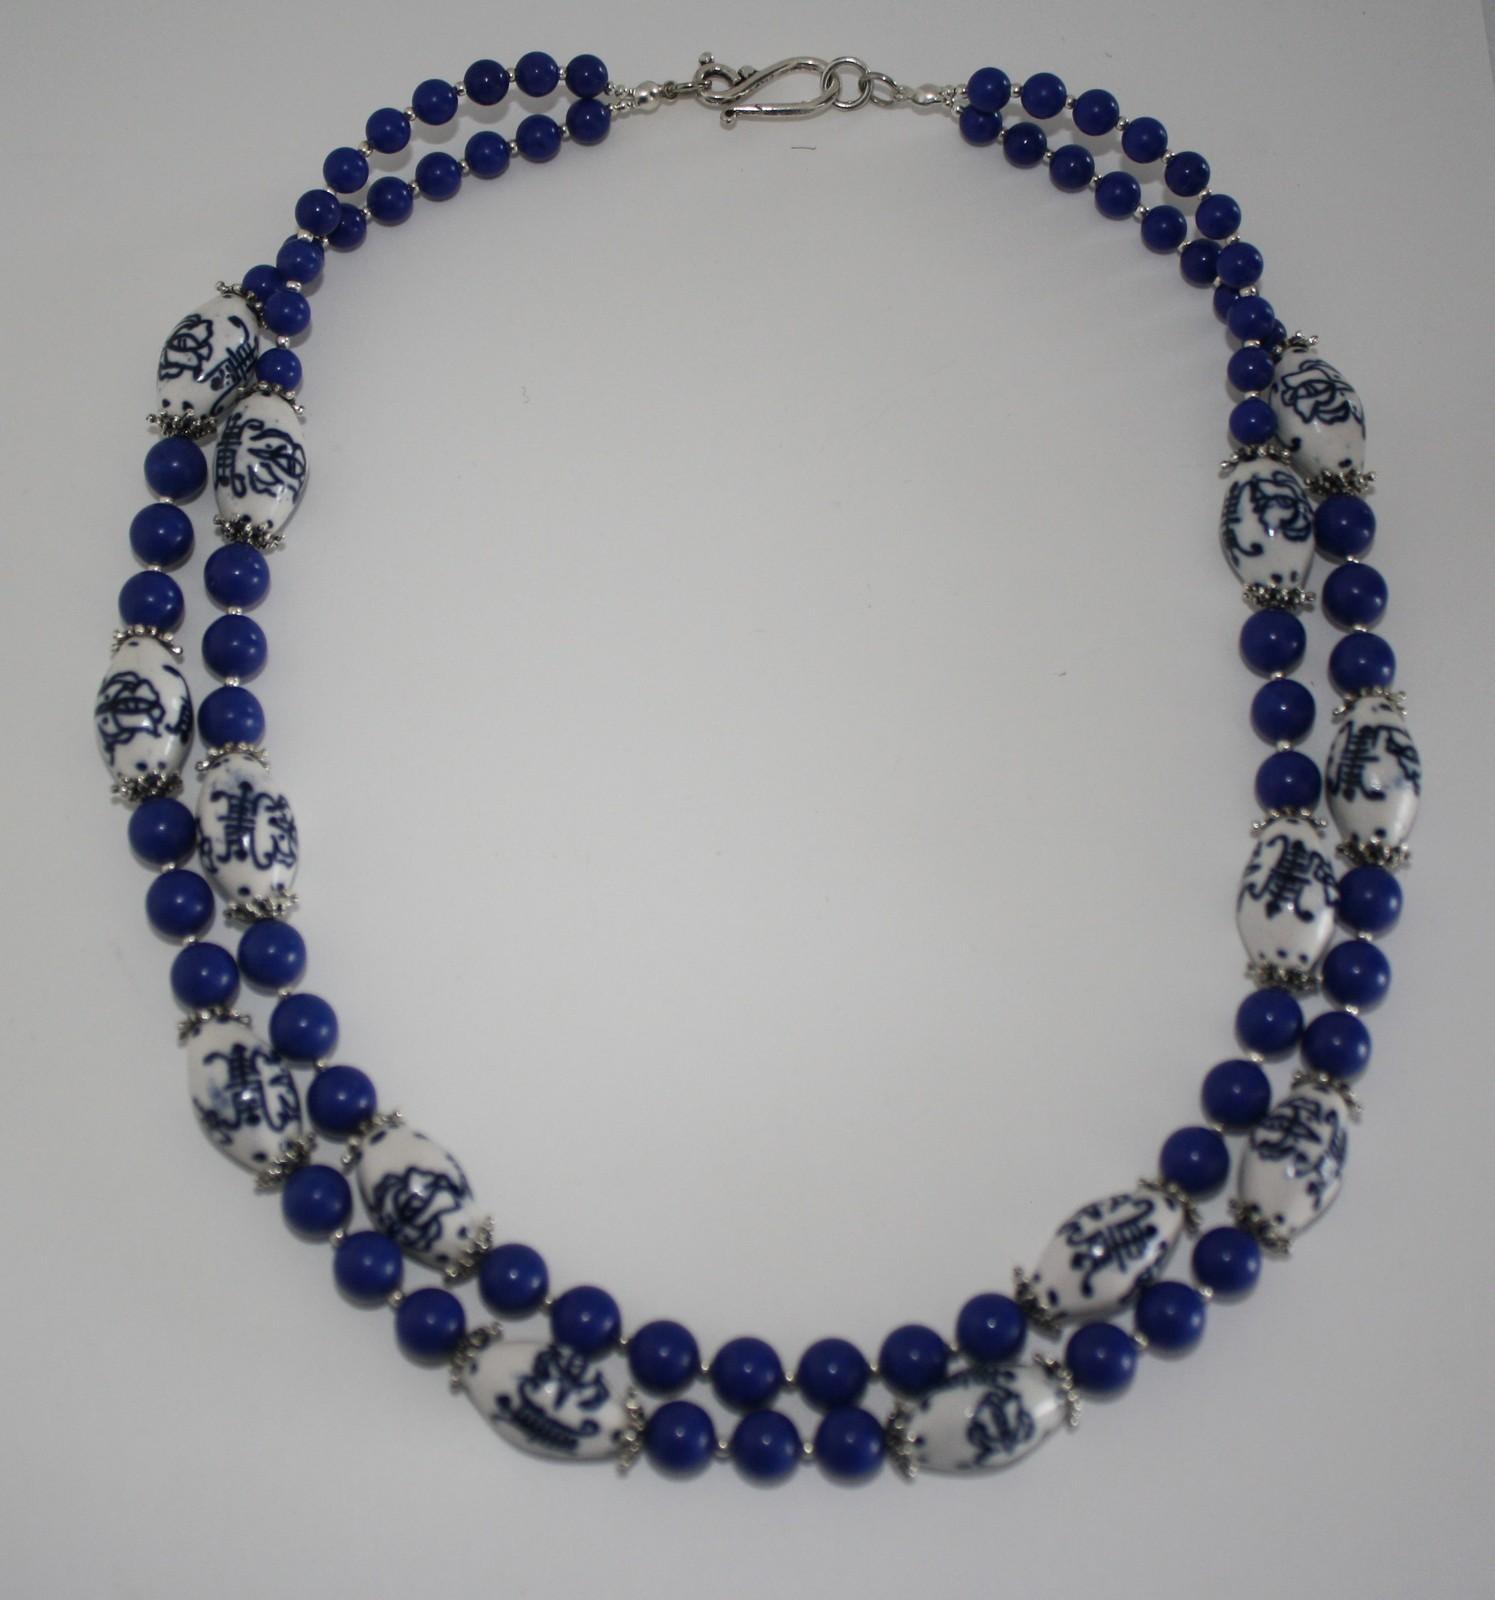 Traditonal Blue & White Chinese Porcelain & Lapis Lazuli Necklace & Earrings Set